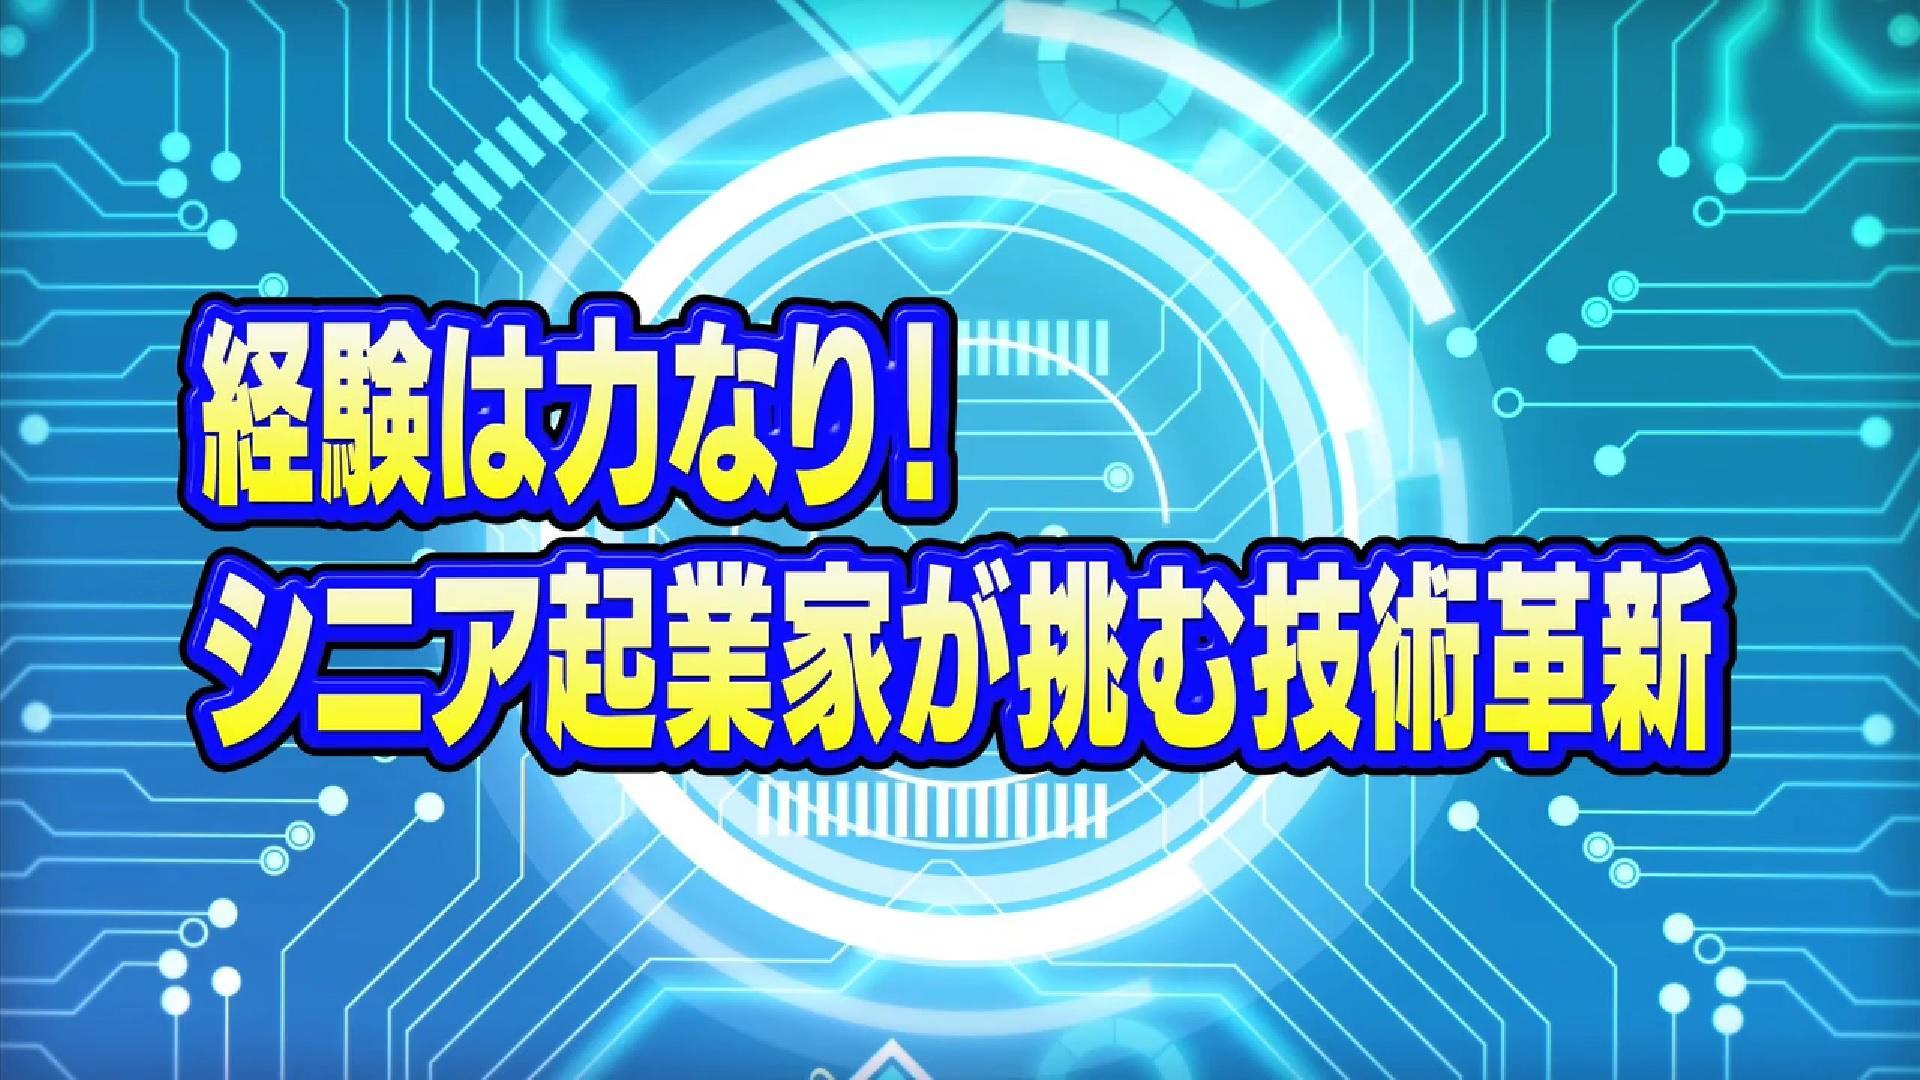 20181003_nikkeitlx_02.jpg